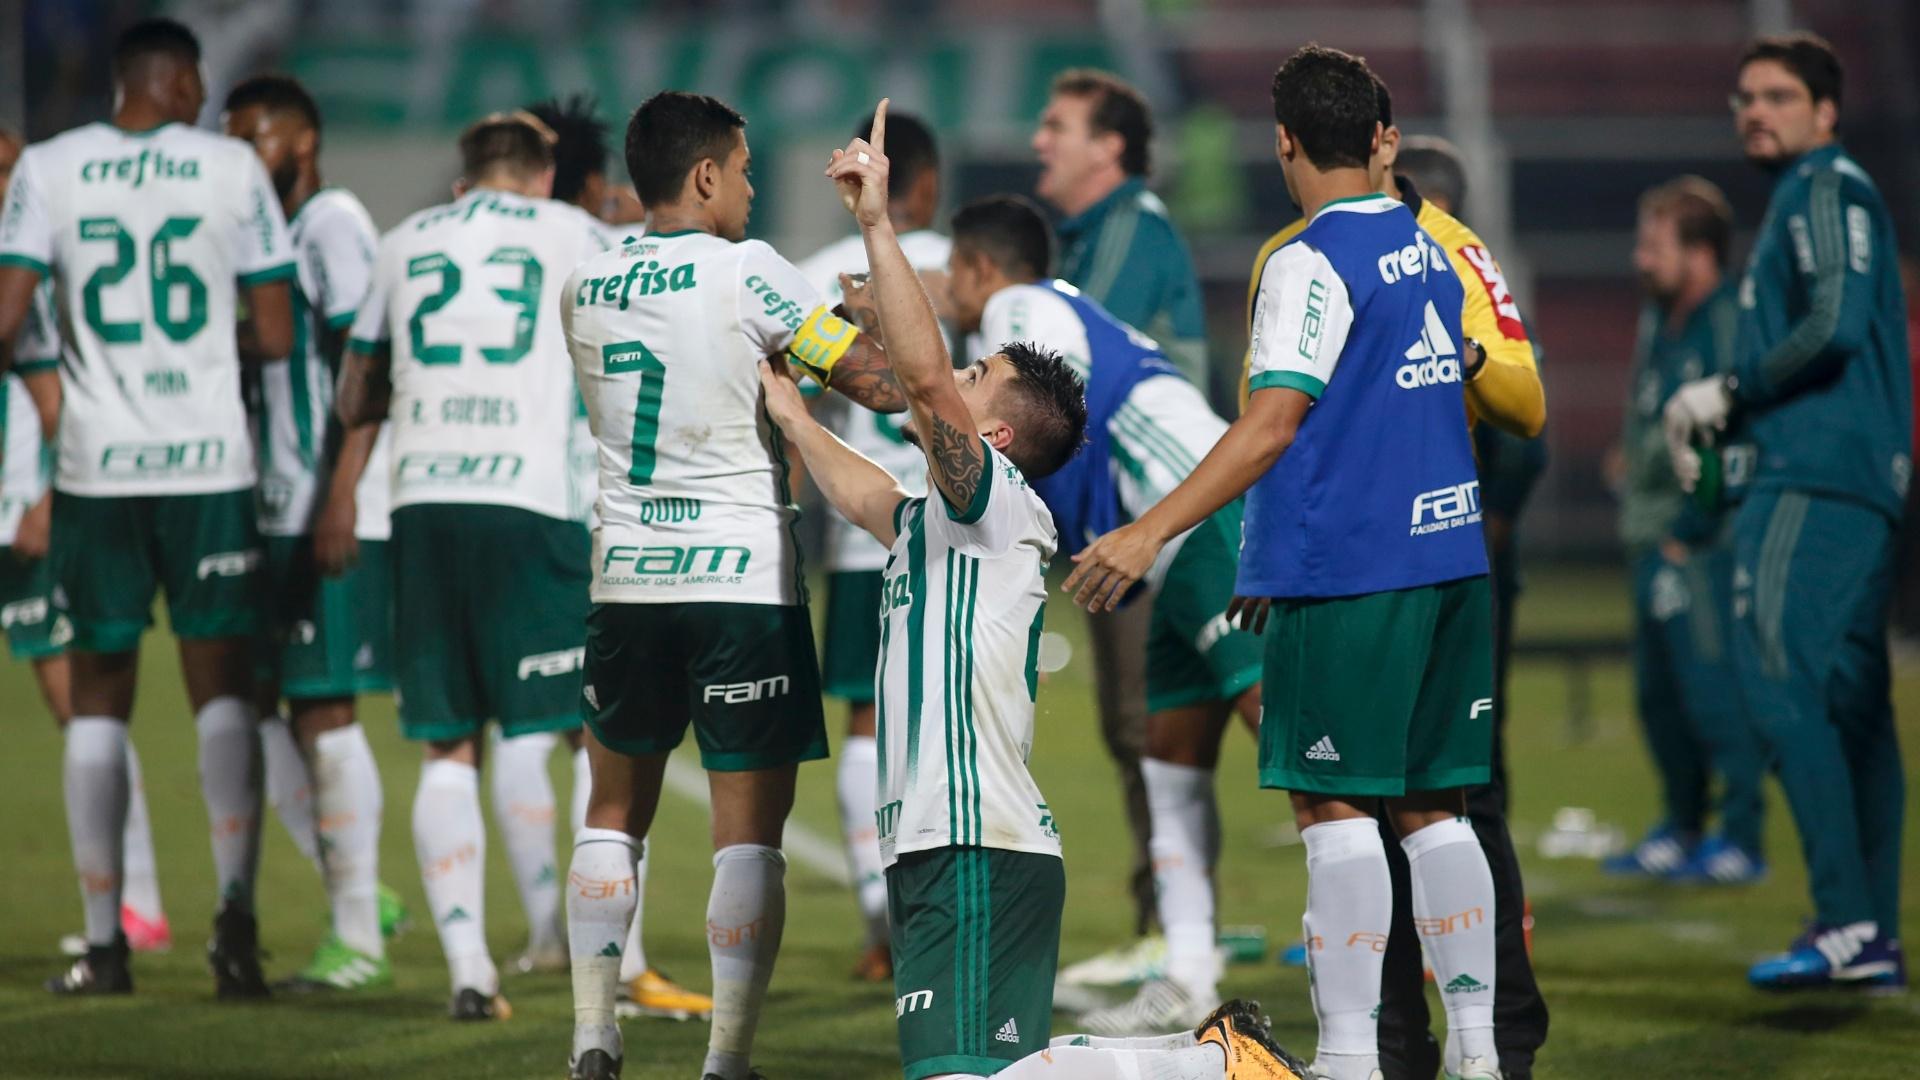 Willian comemora após empatar para o Palmeiras contra o Flamengo